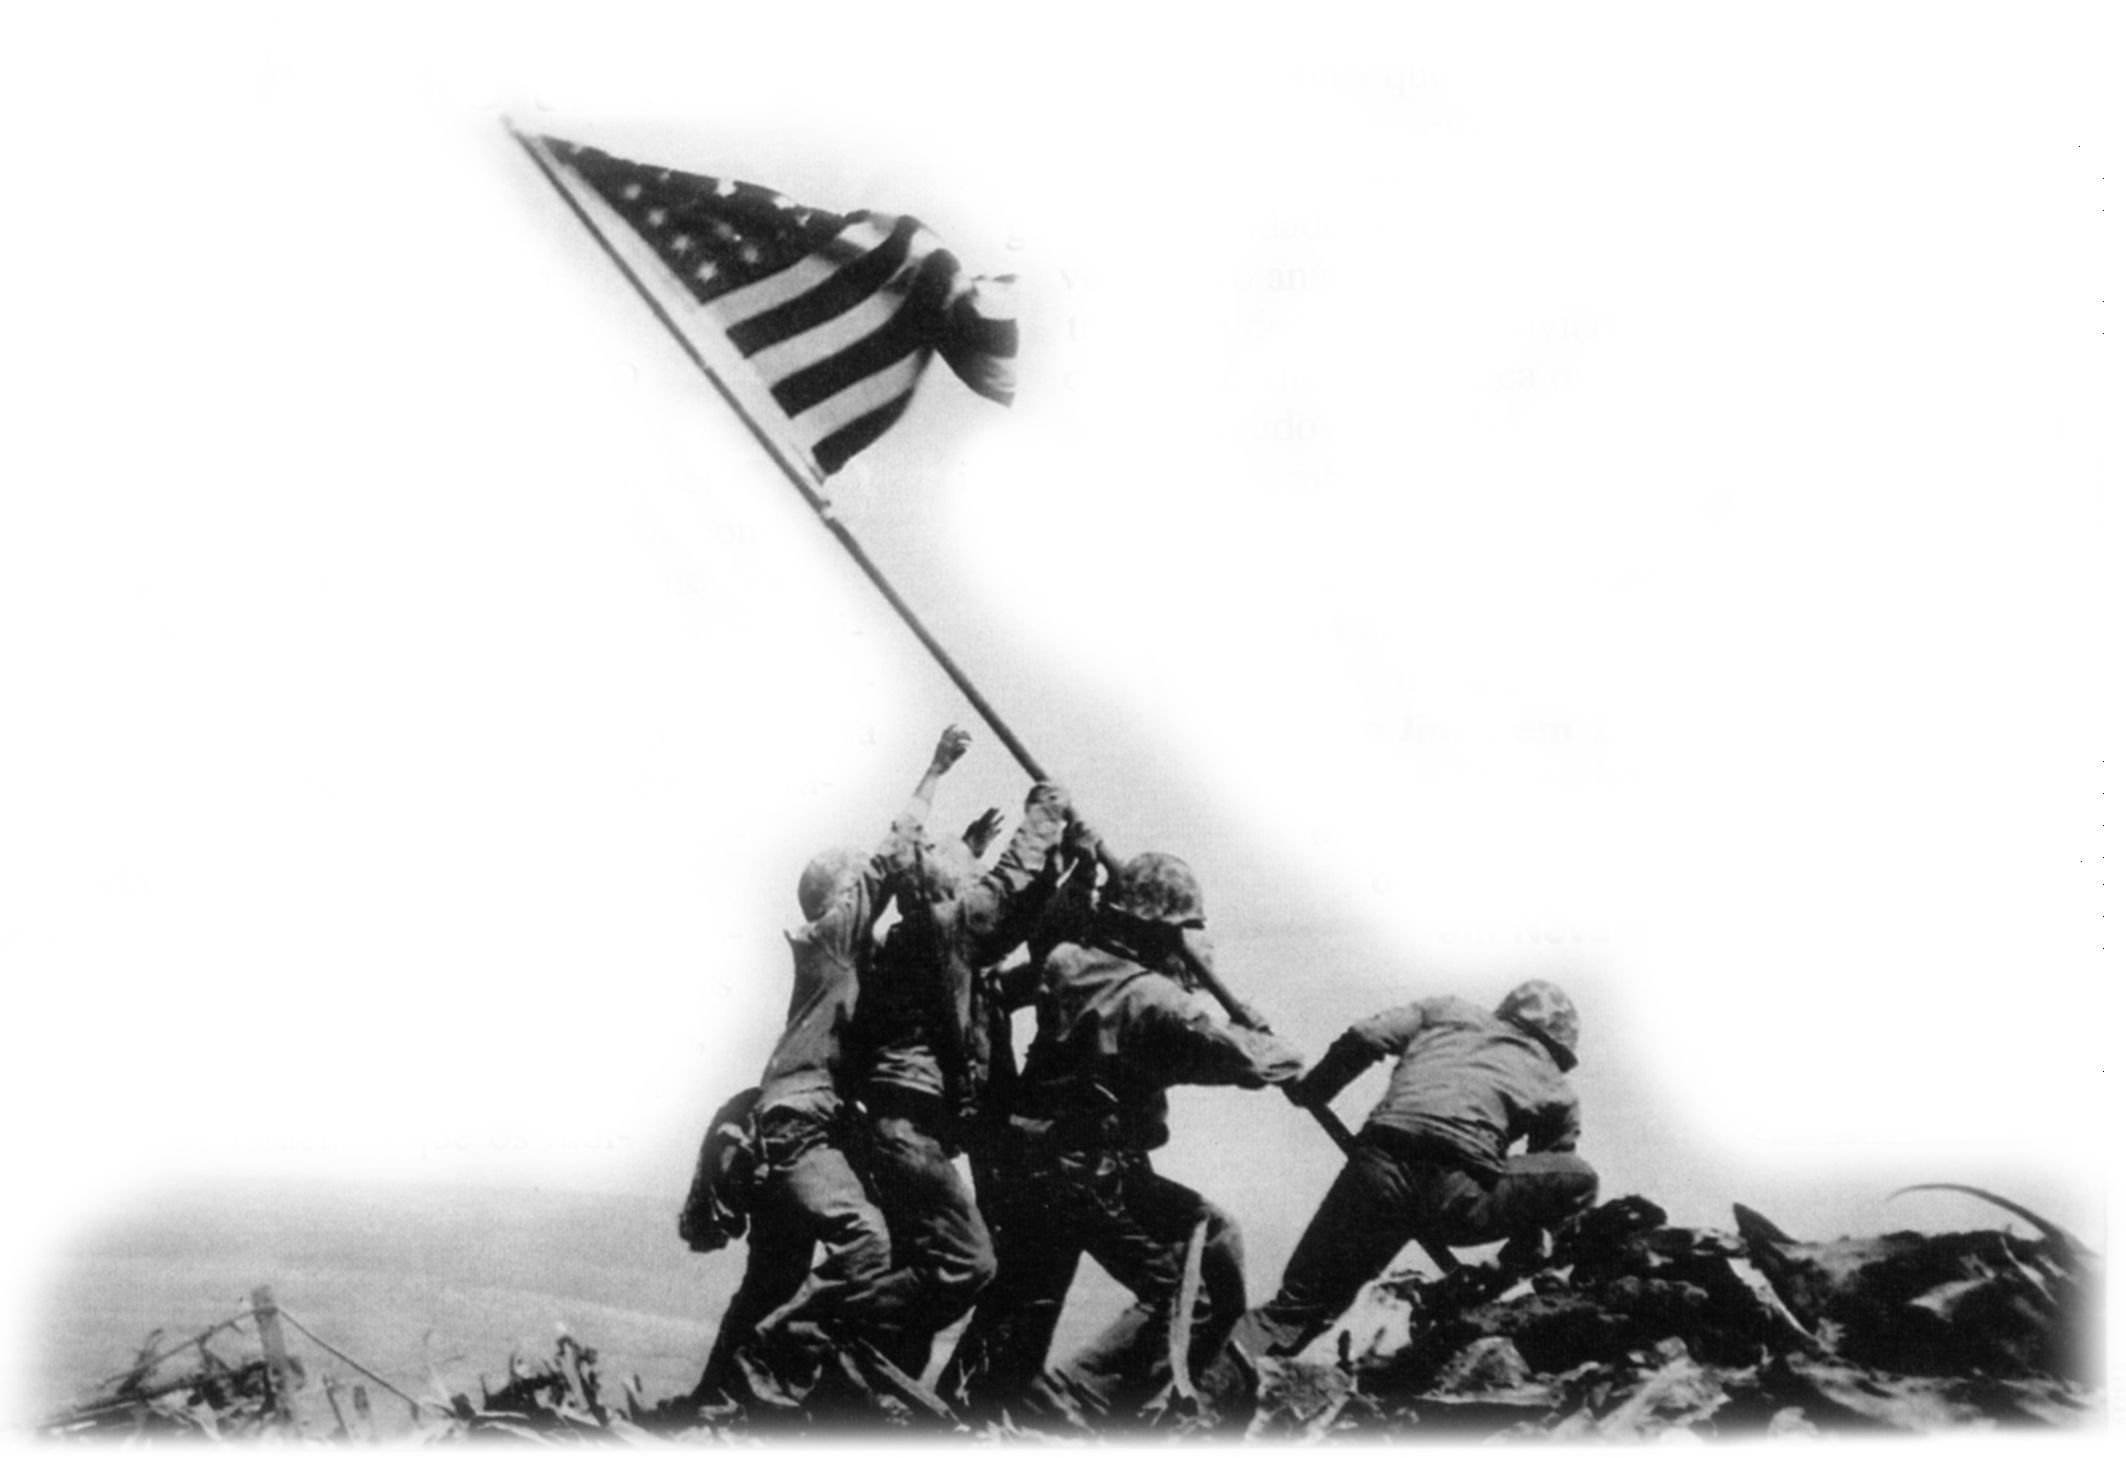 Língua Portuguesa, Arte e Literatura: 06 - O Memorial de Iwo Jima